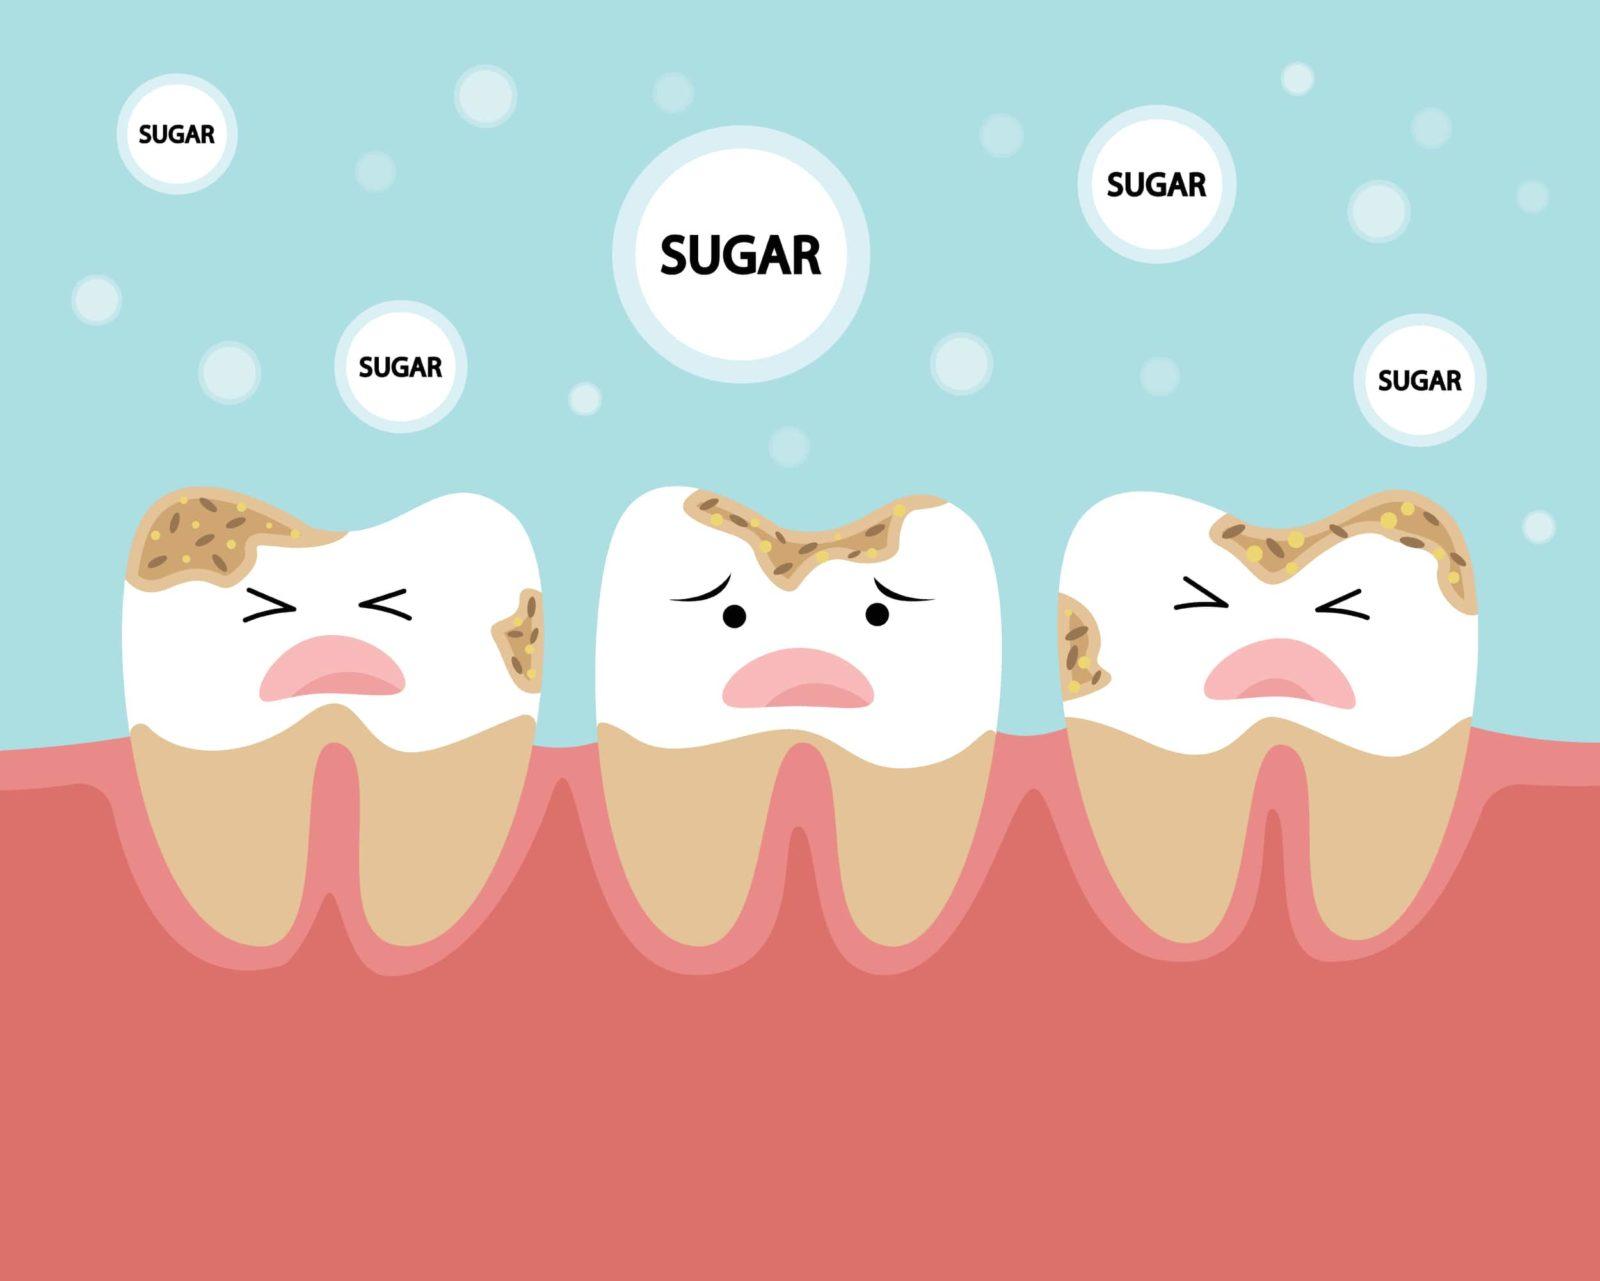 cartoon of teeth being attacked by sugar